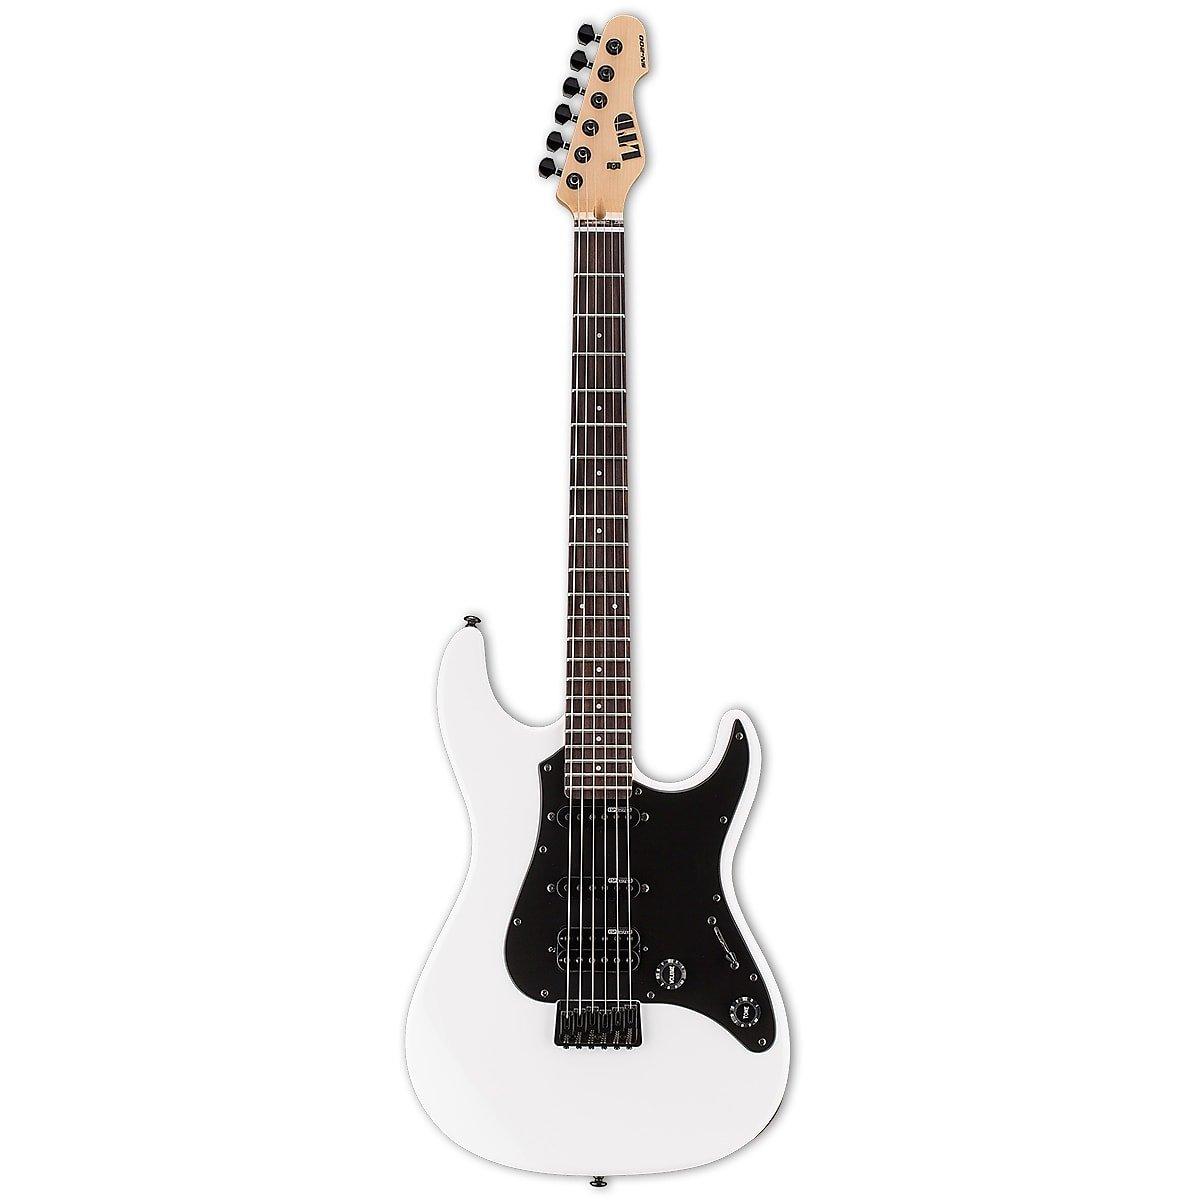 ESP LTD SN-200HT White